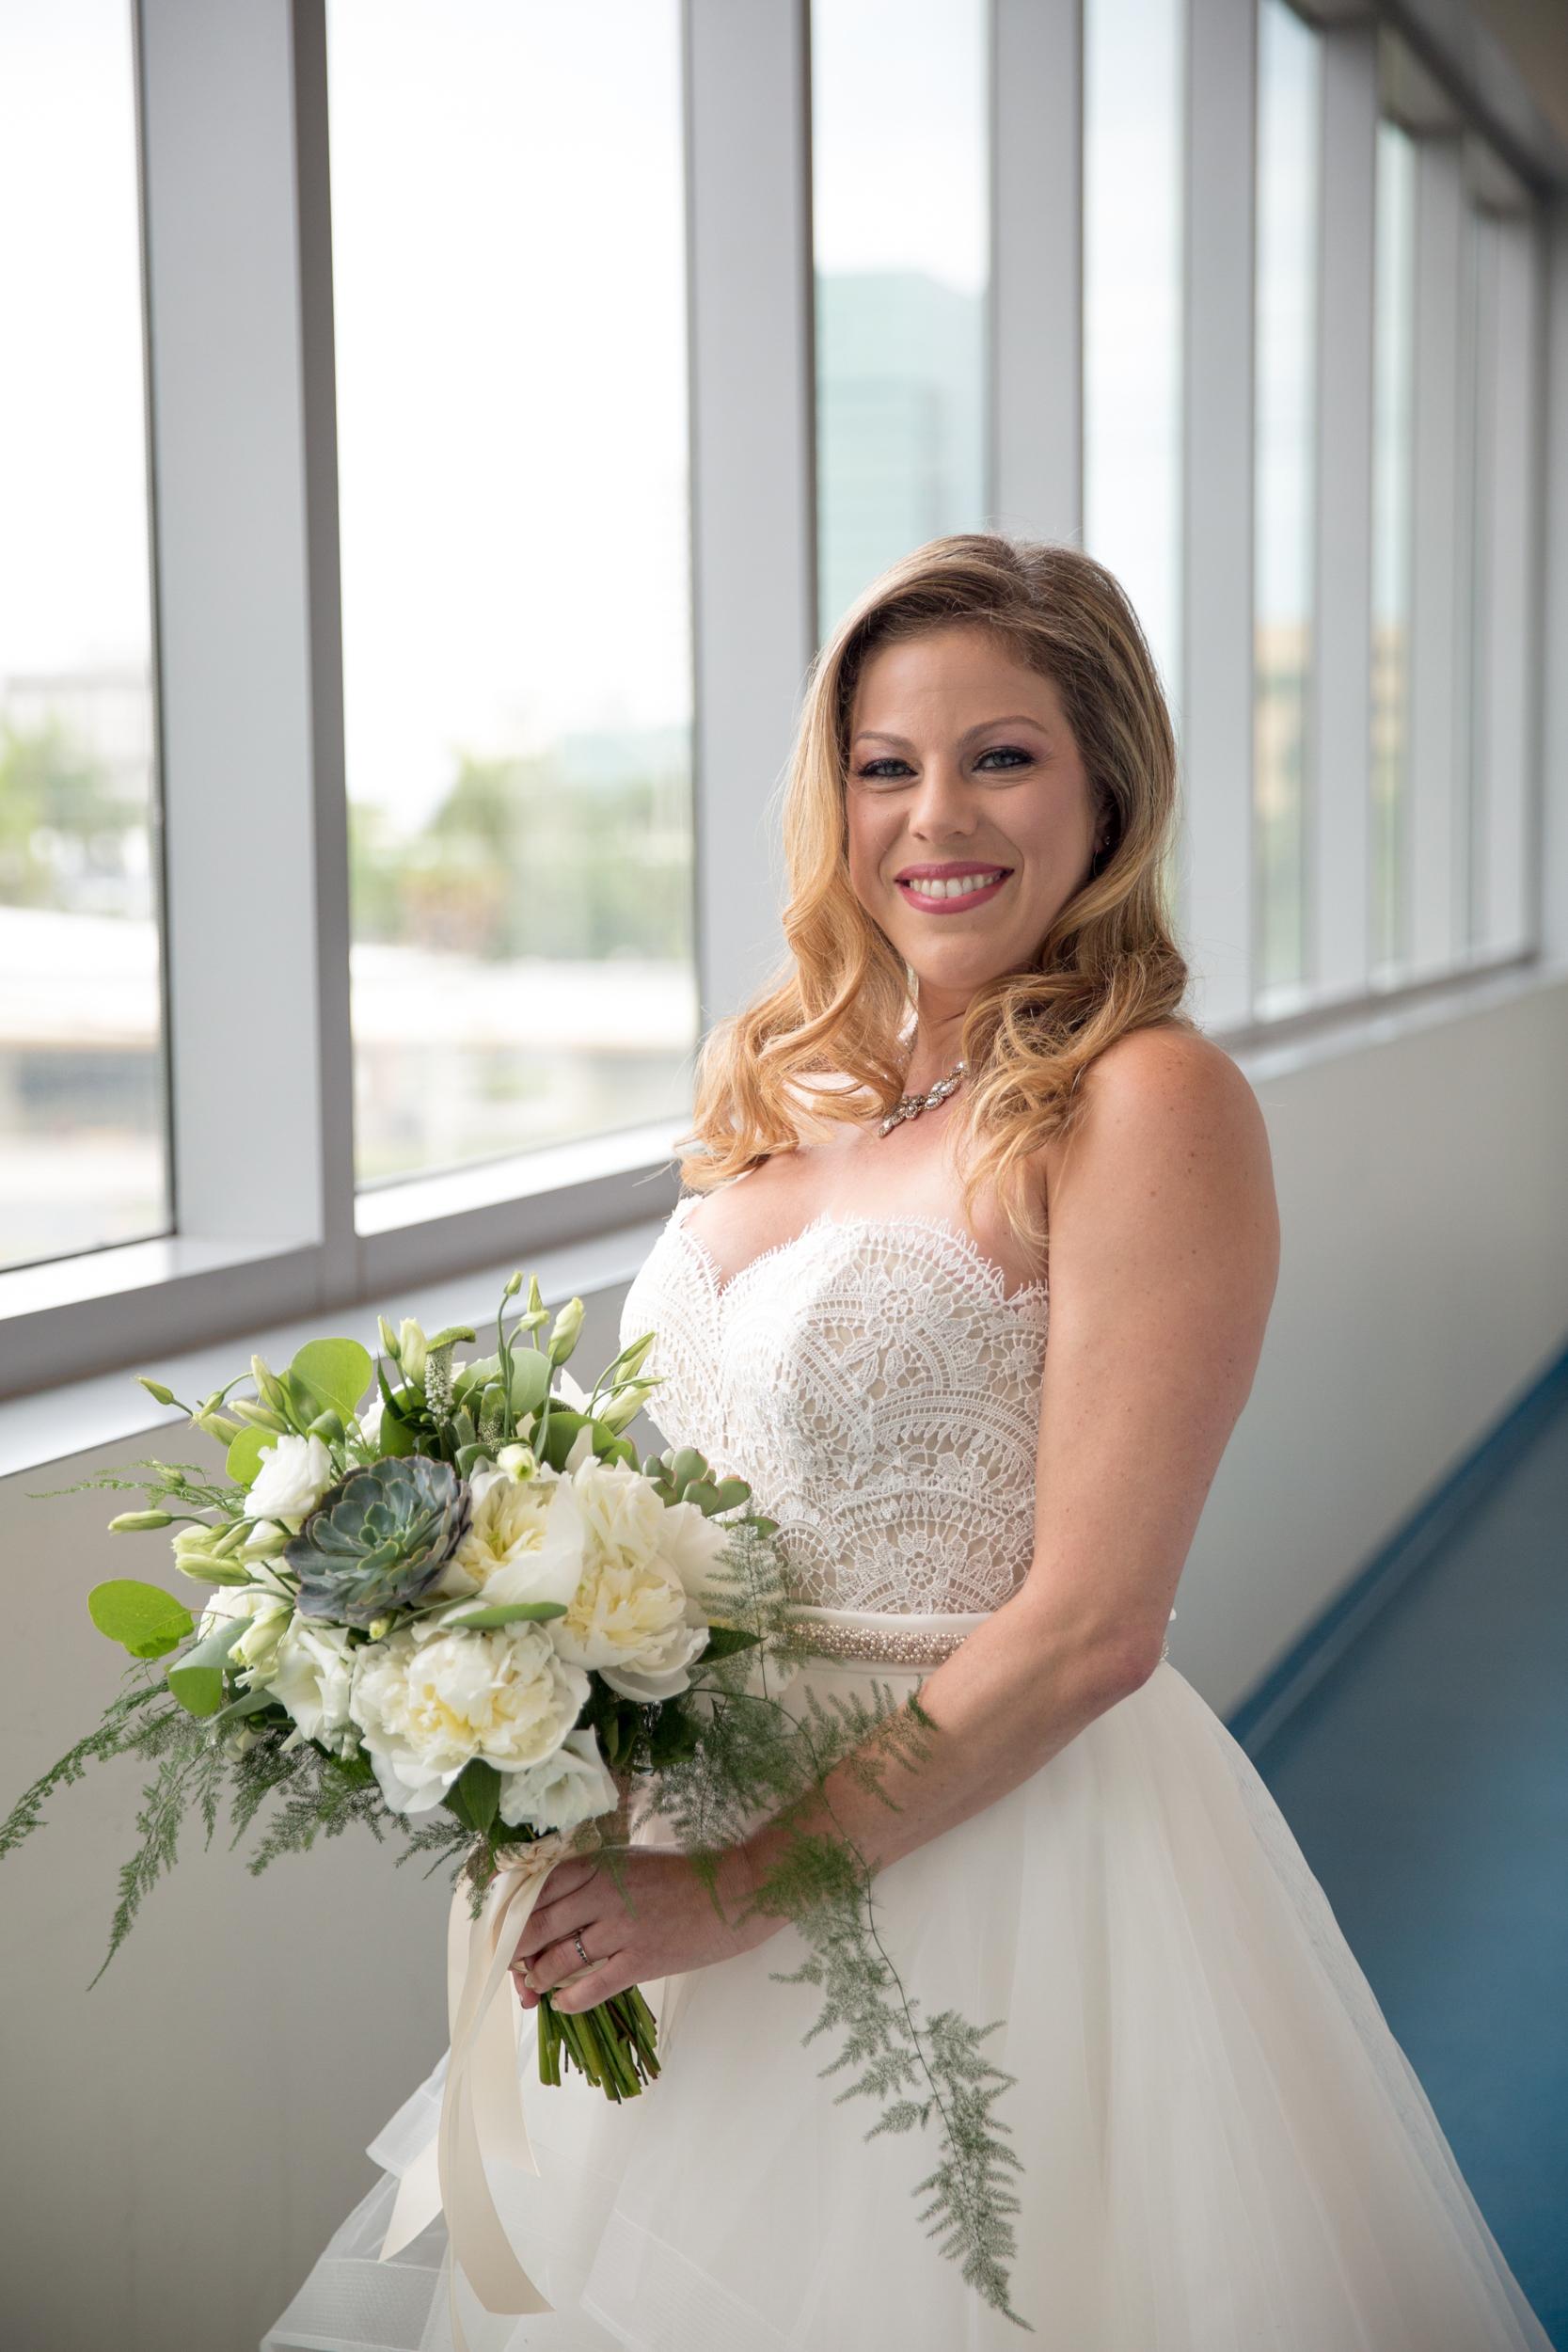 WEB_6-18-17_MindyChris_Wedding-82.jpg